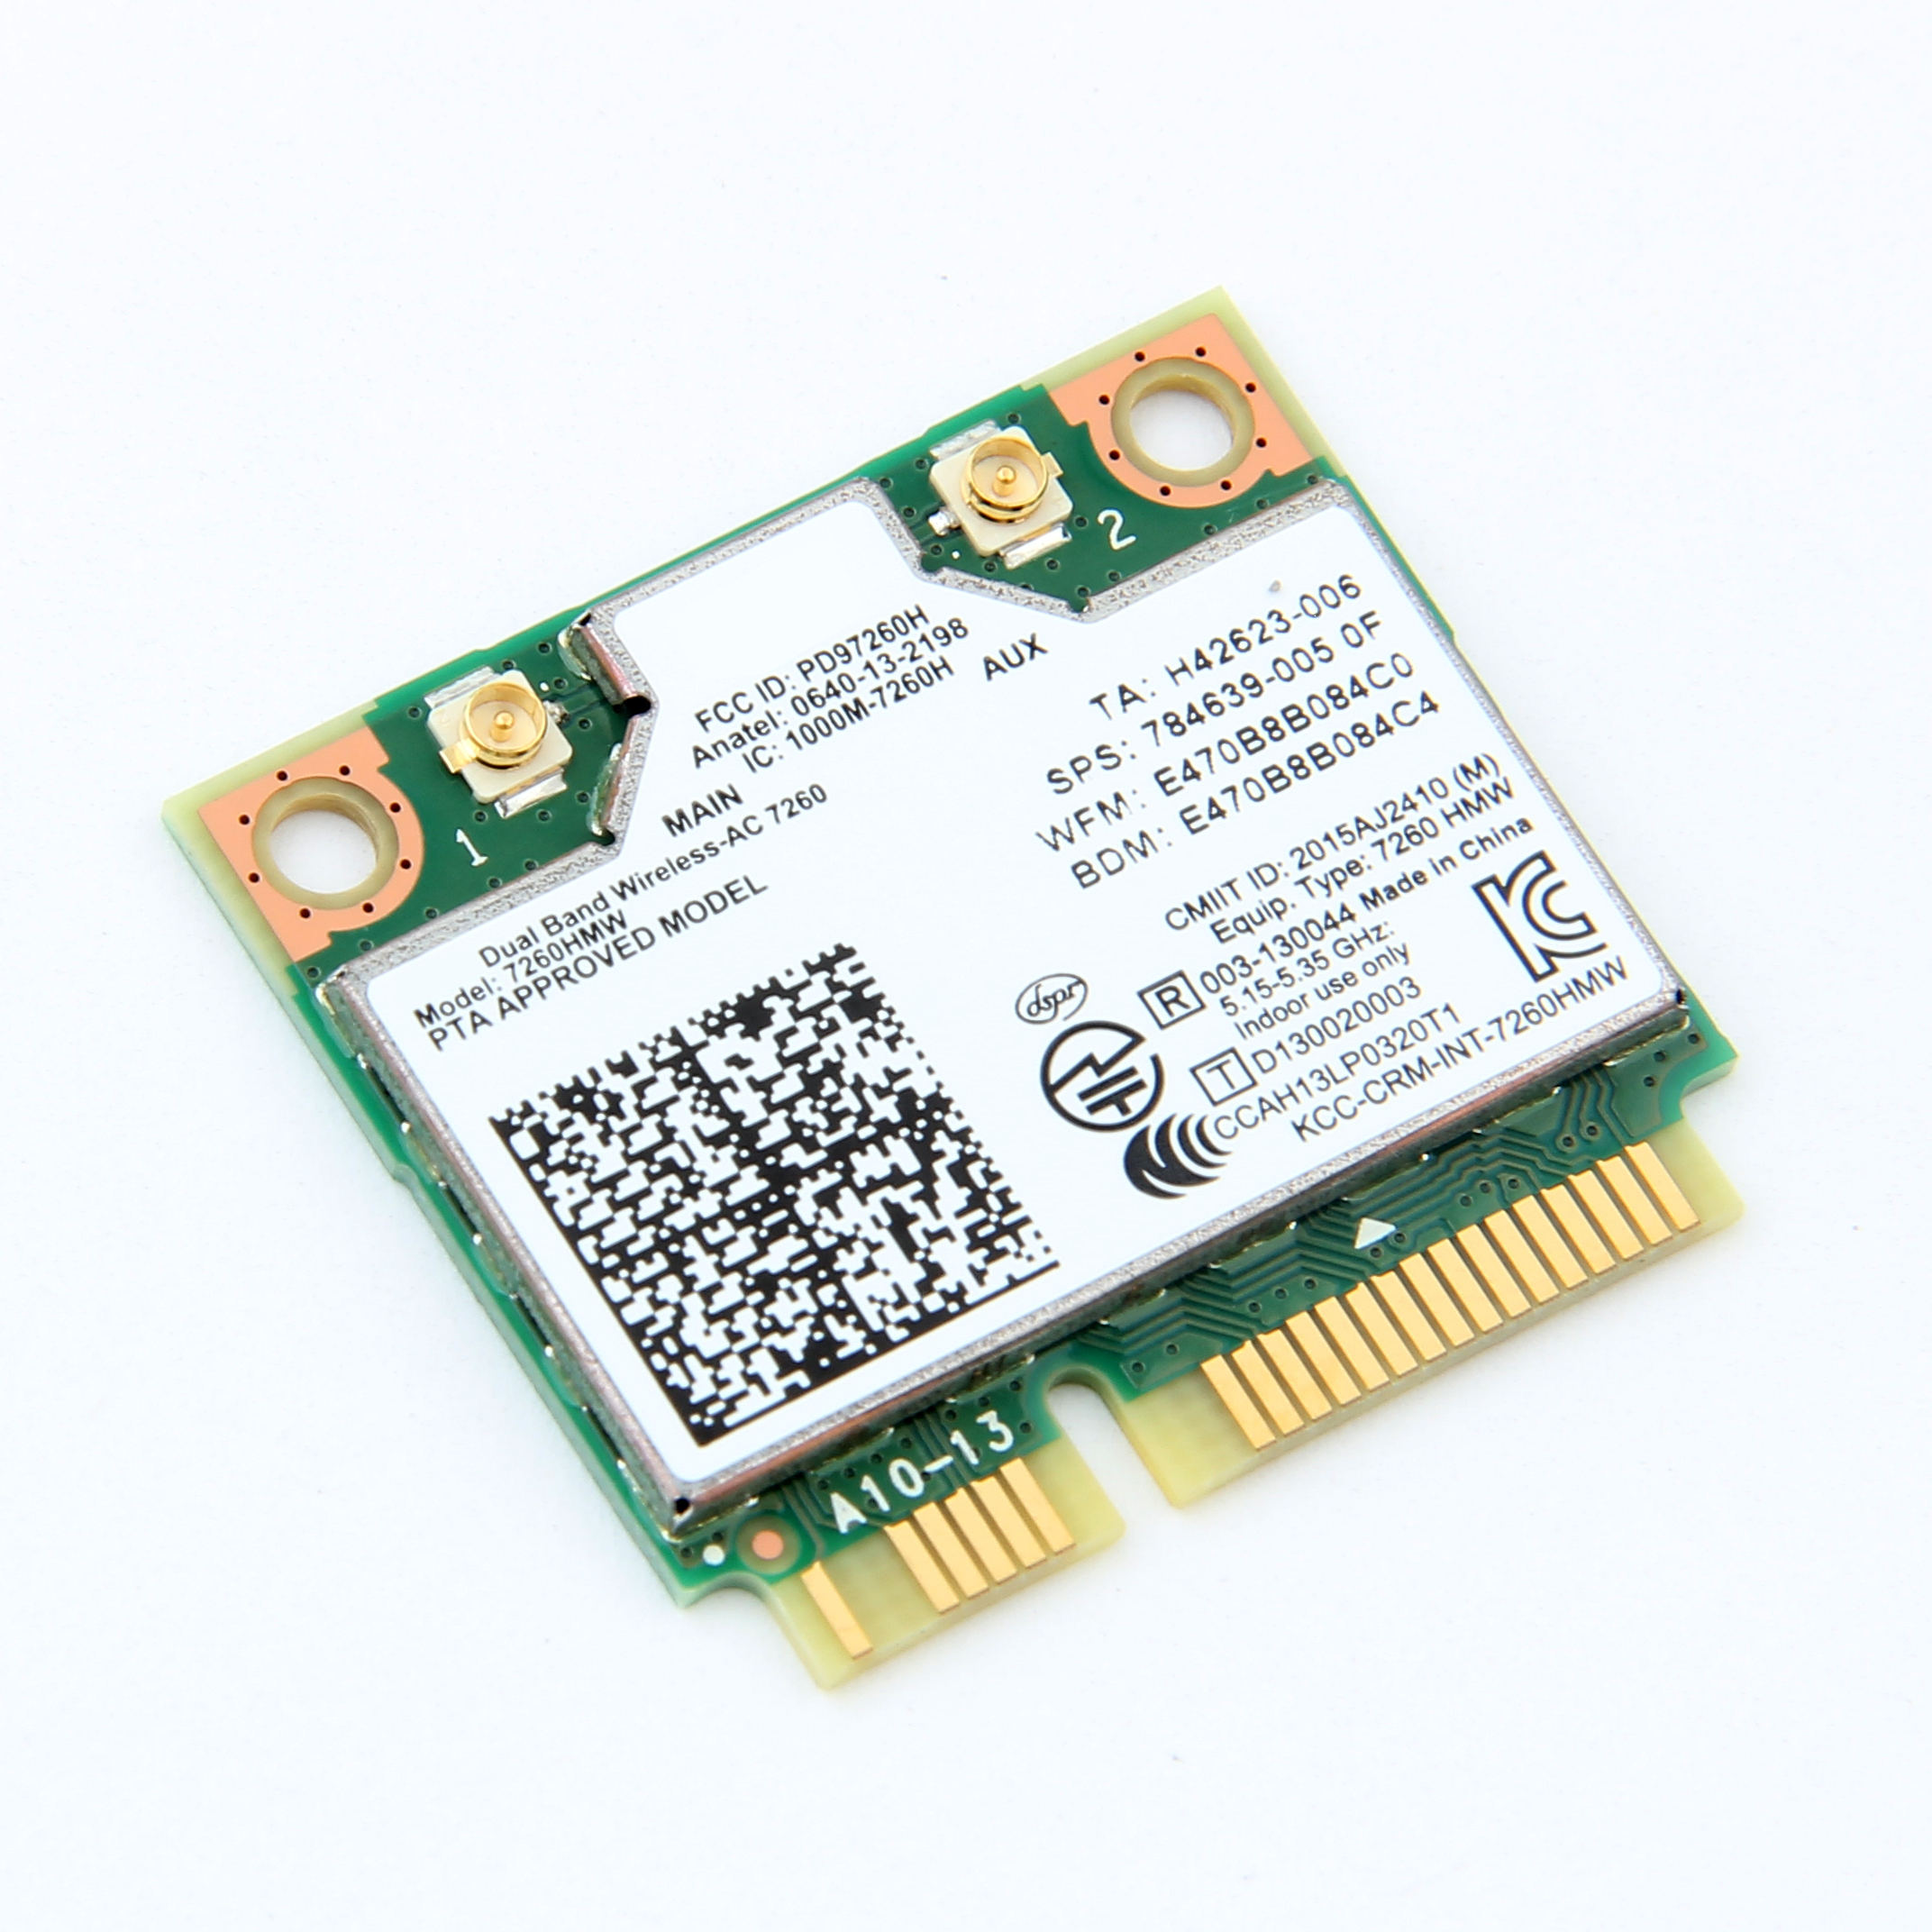 Universal Internal Antenna for Wireless Mini PCI PCI-E Laptop 7260hmw 2230 6300